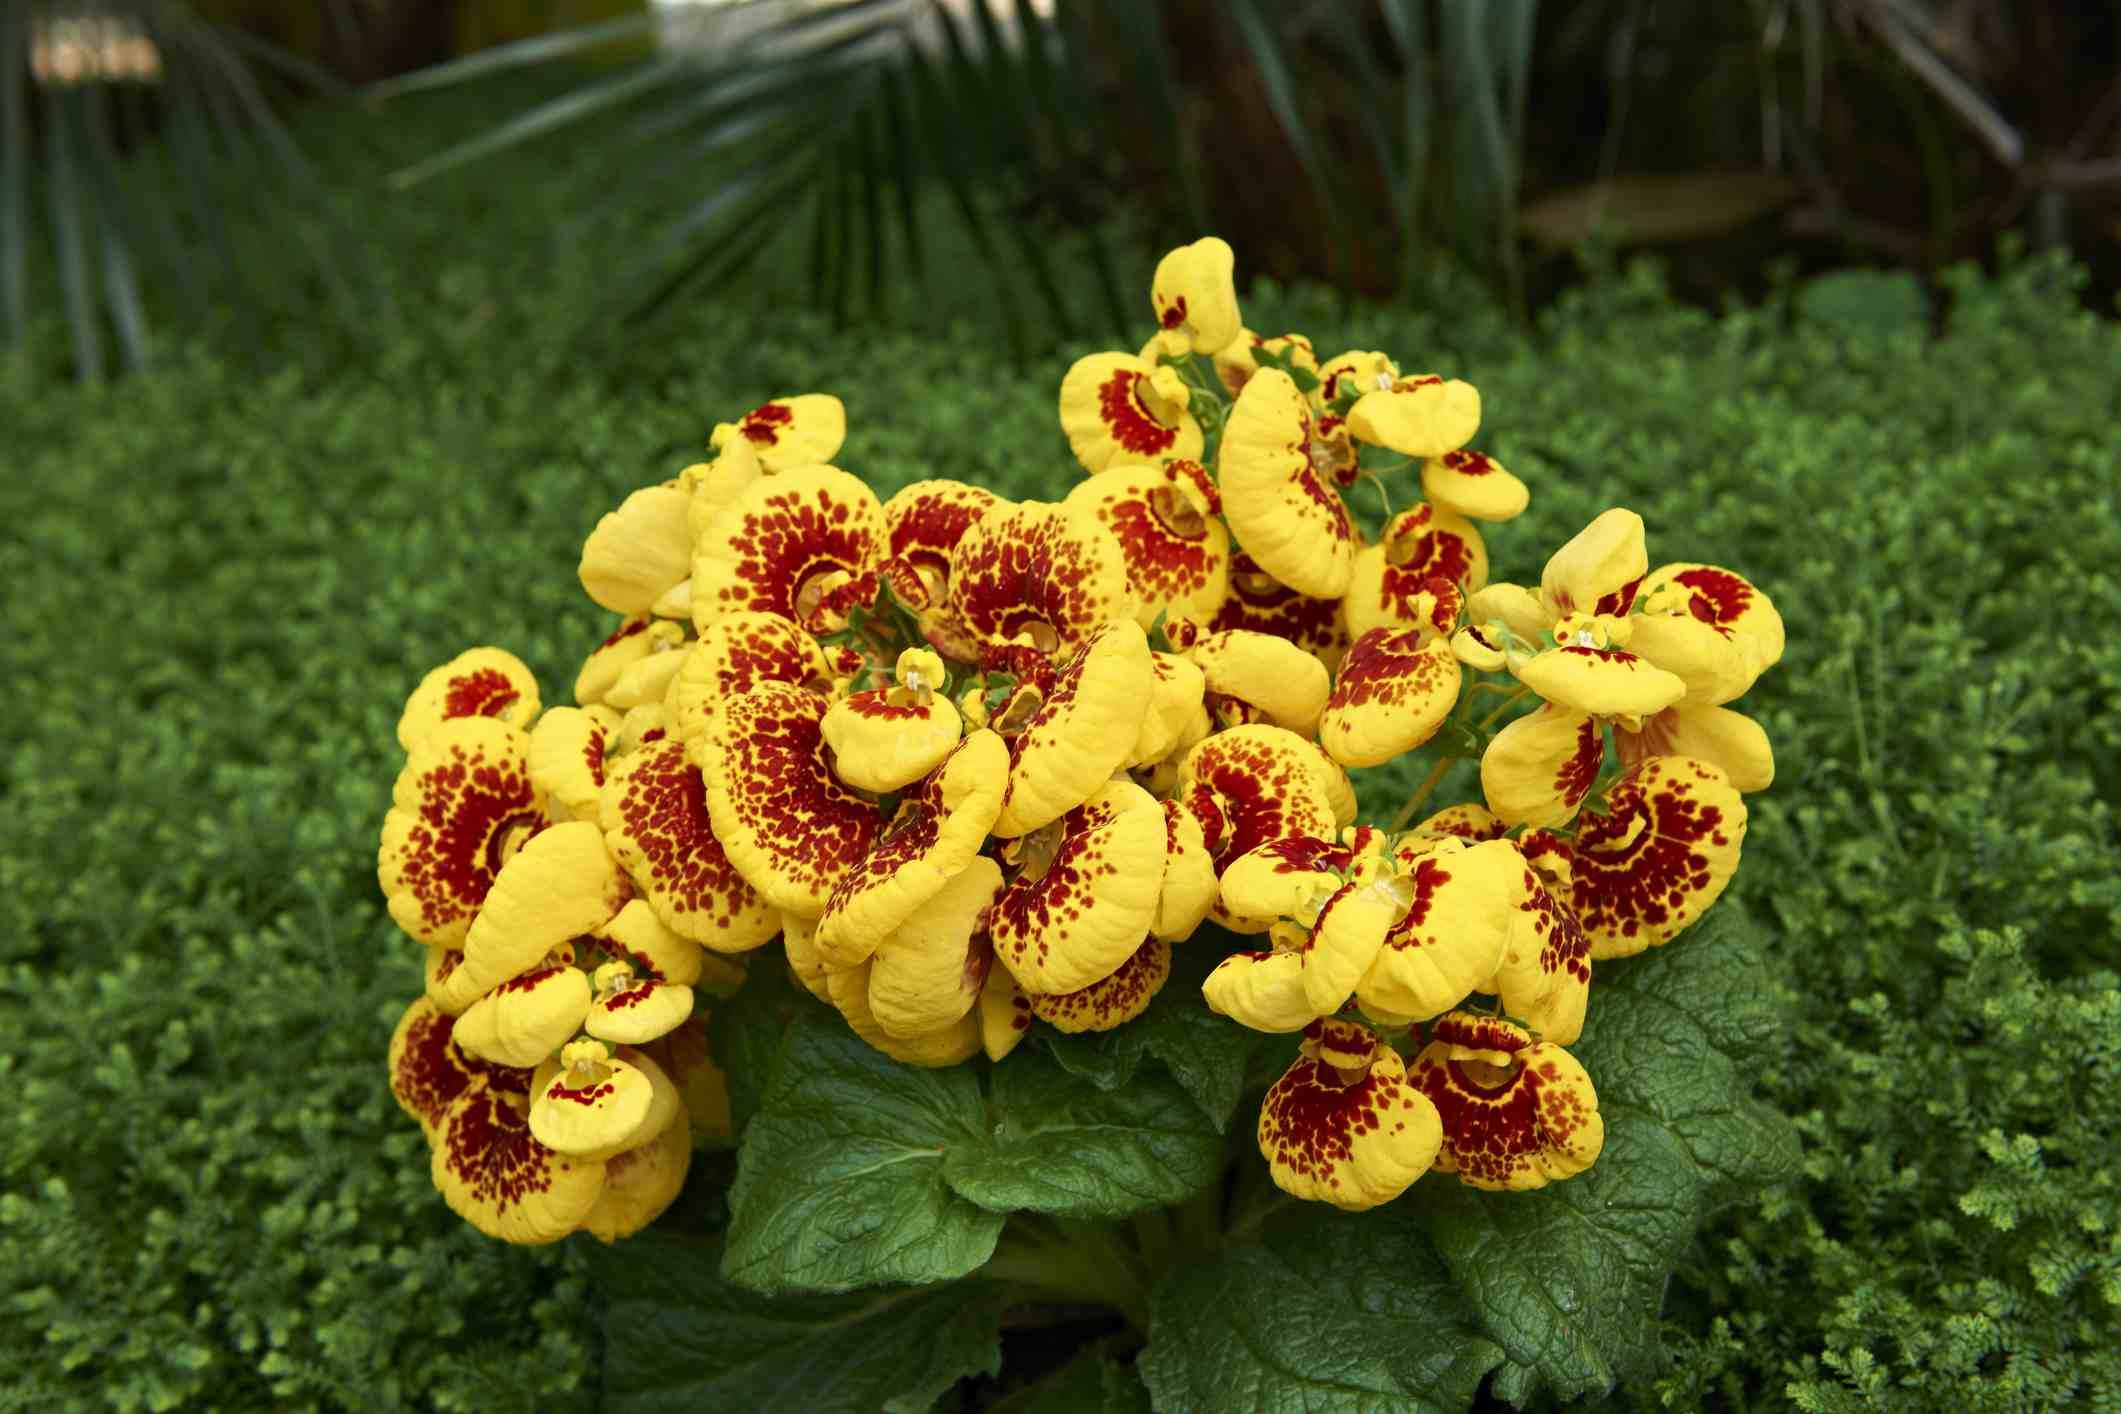 Calceolaria flowers